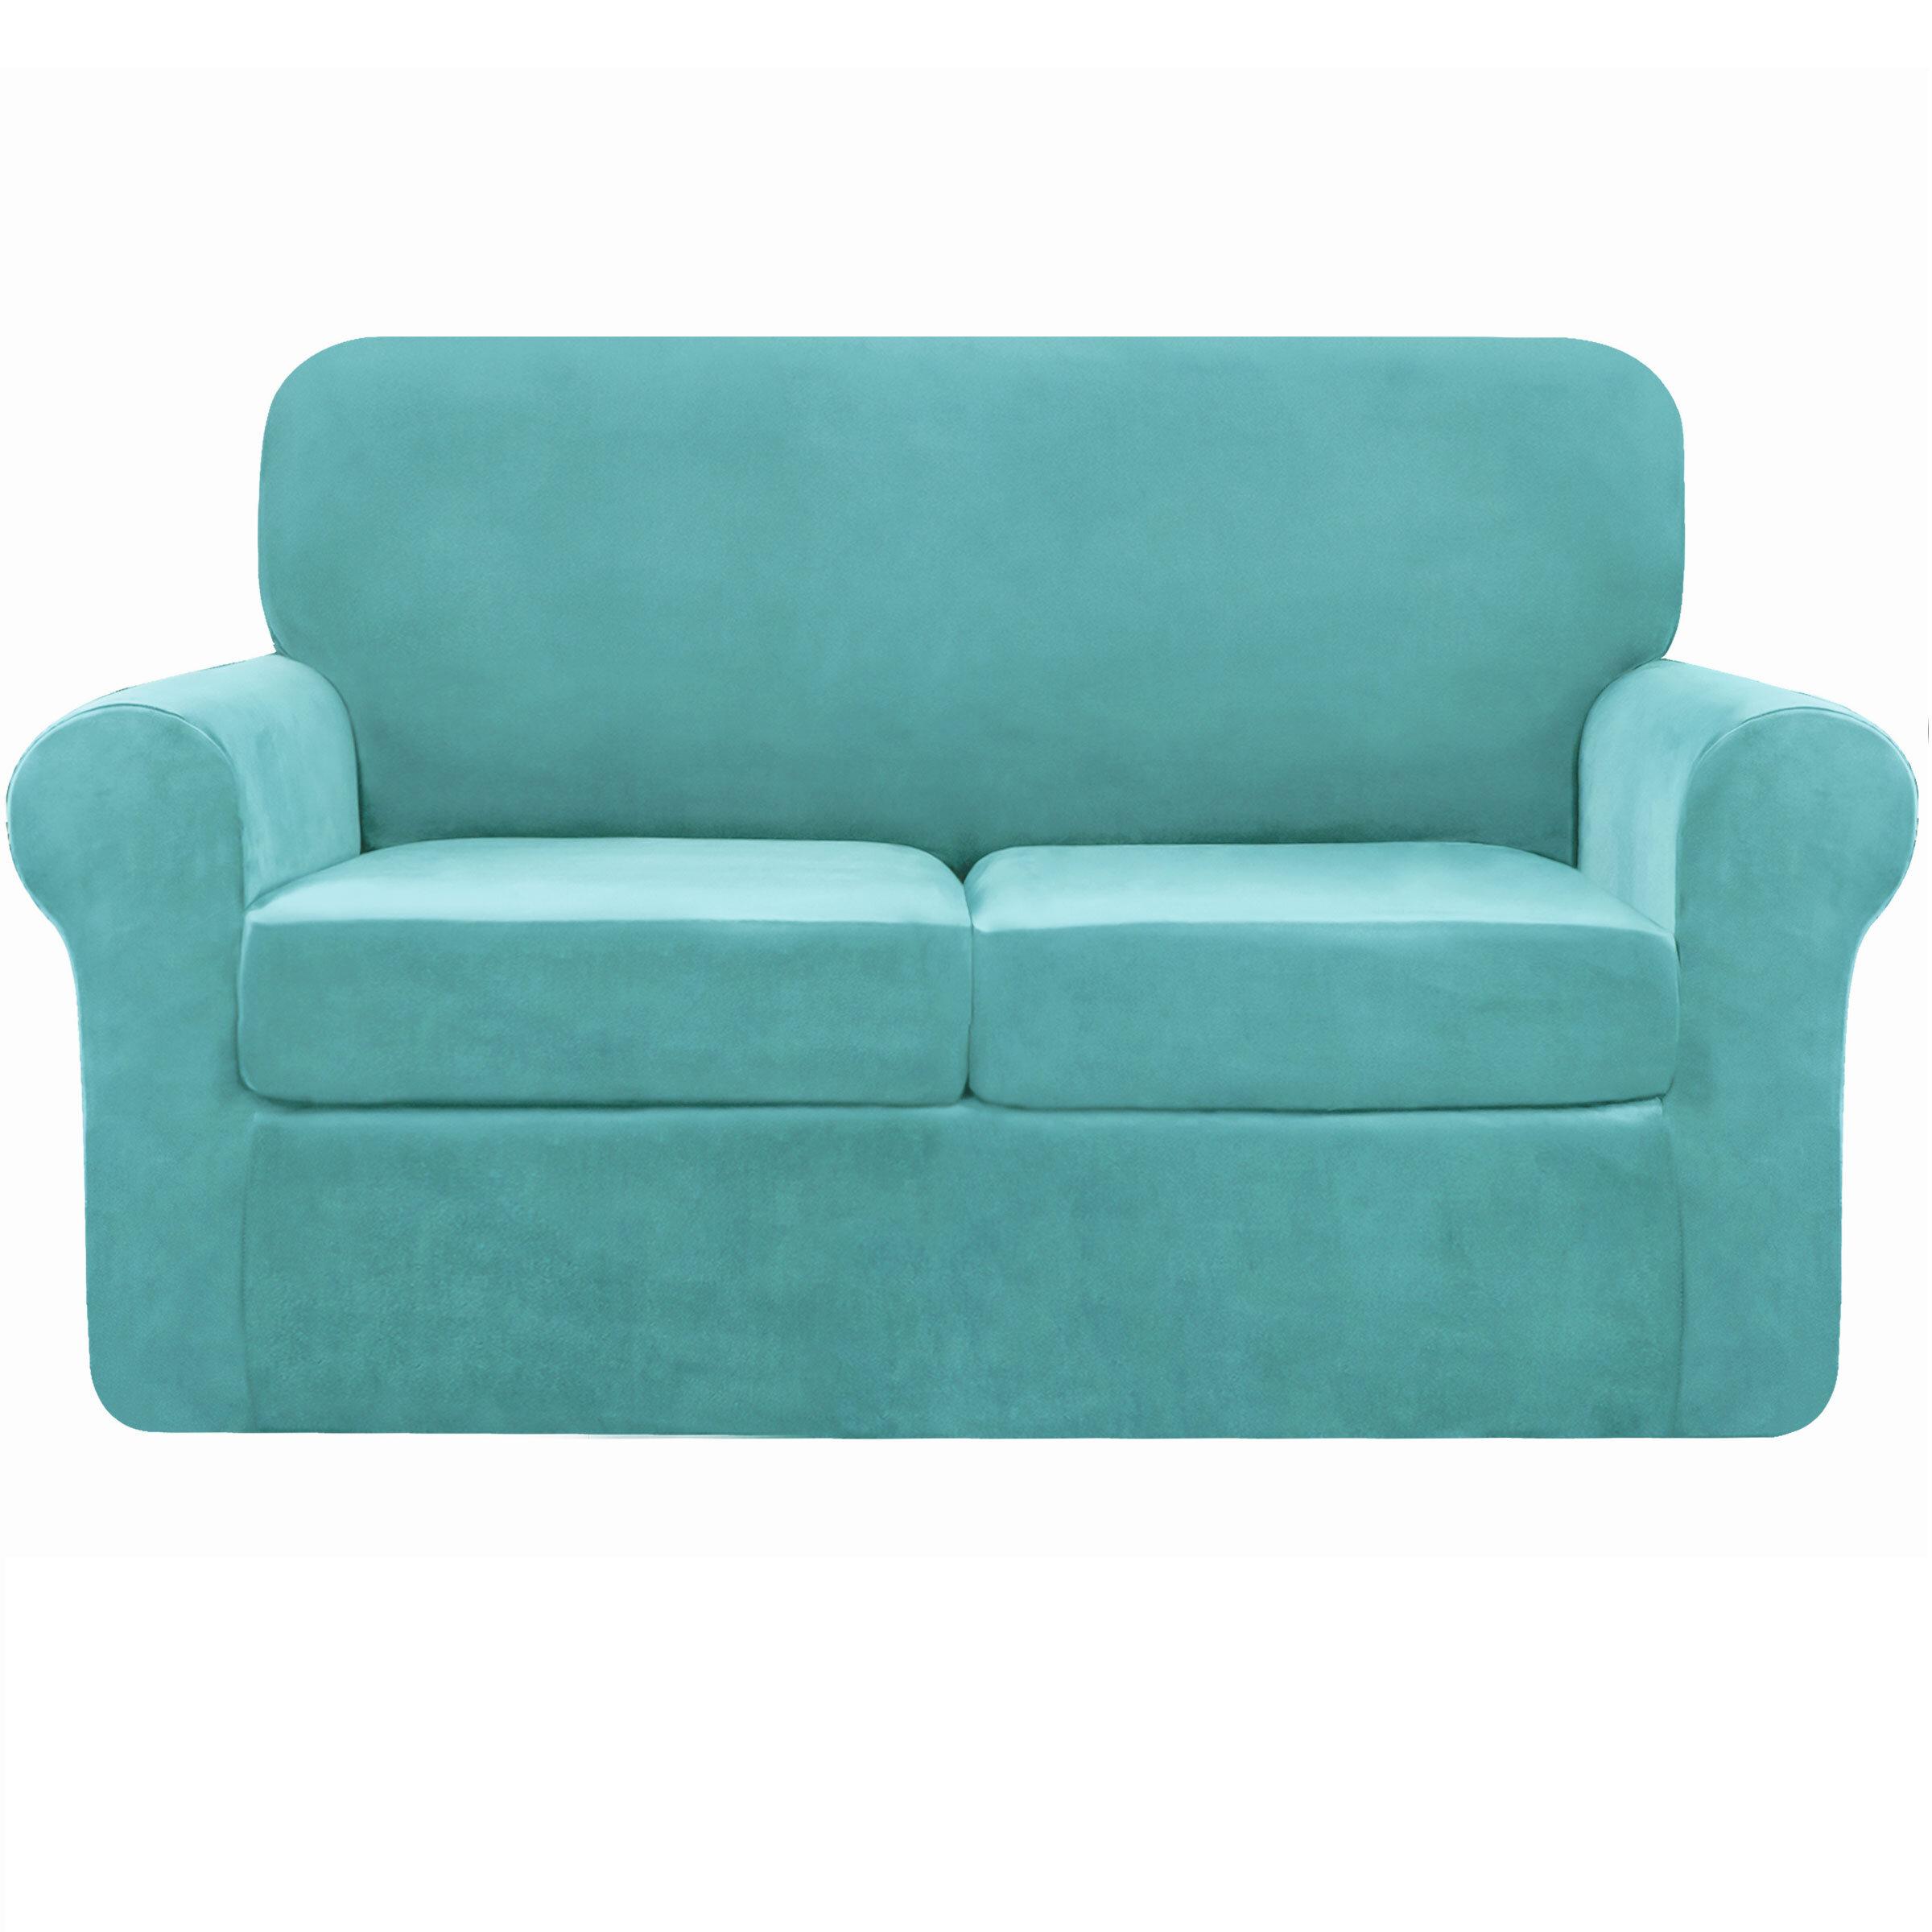 Regular Box Cushion Slipcovers You Ll Love Wayfair Co Uk